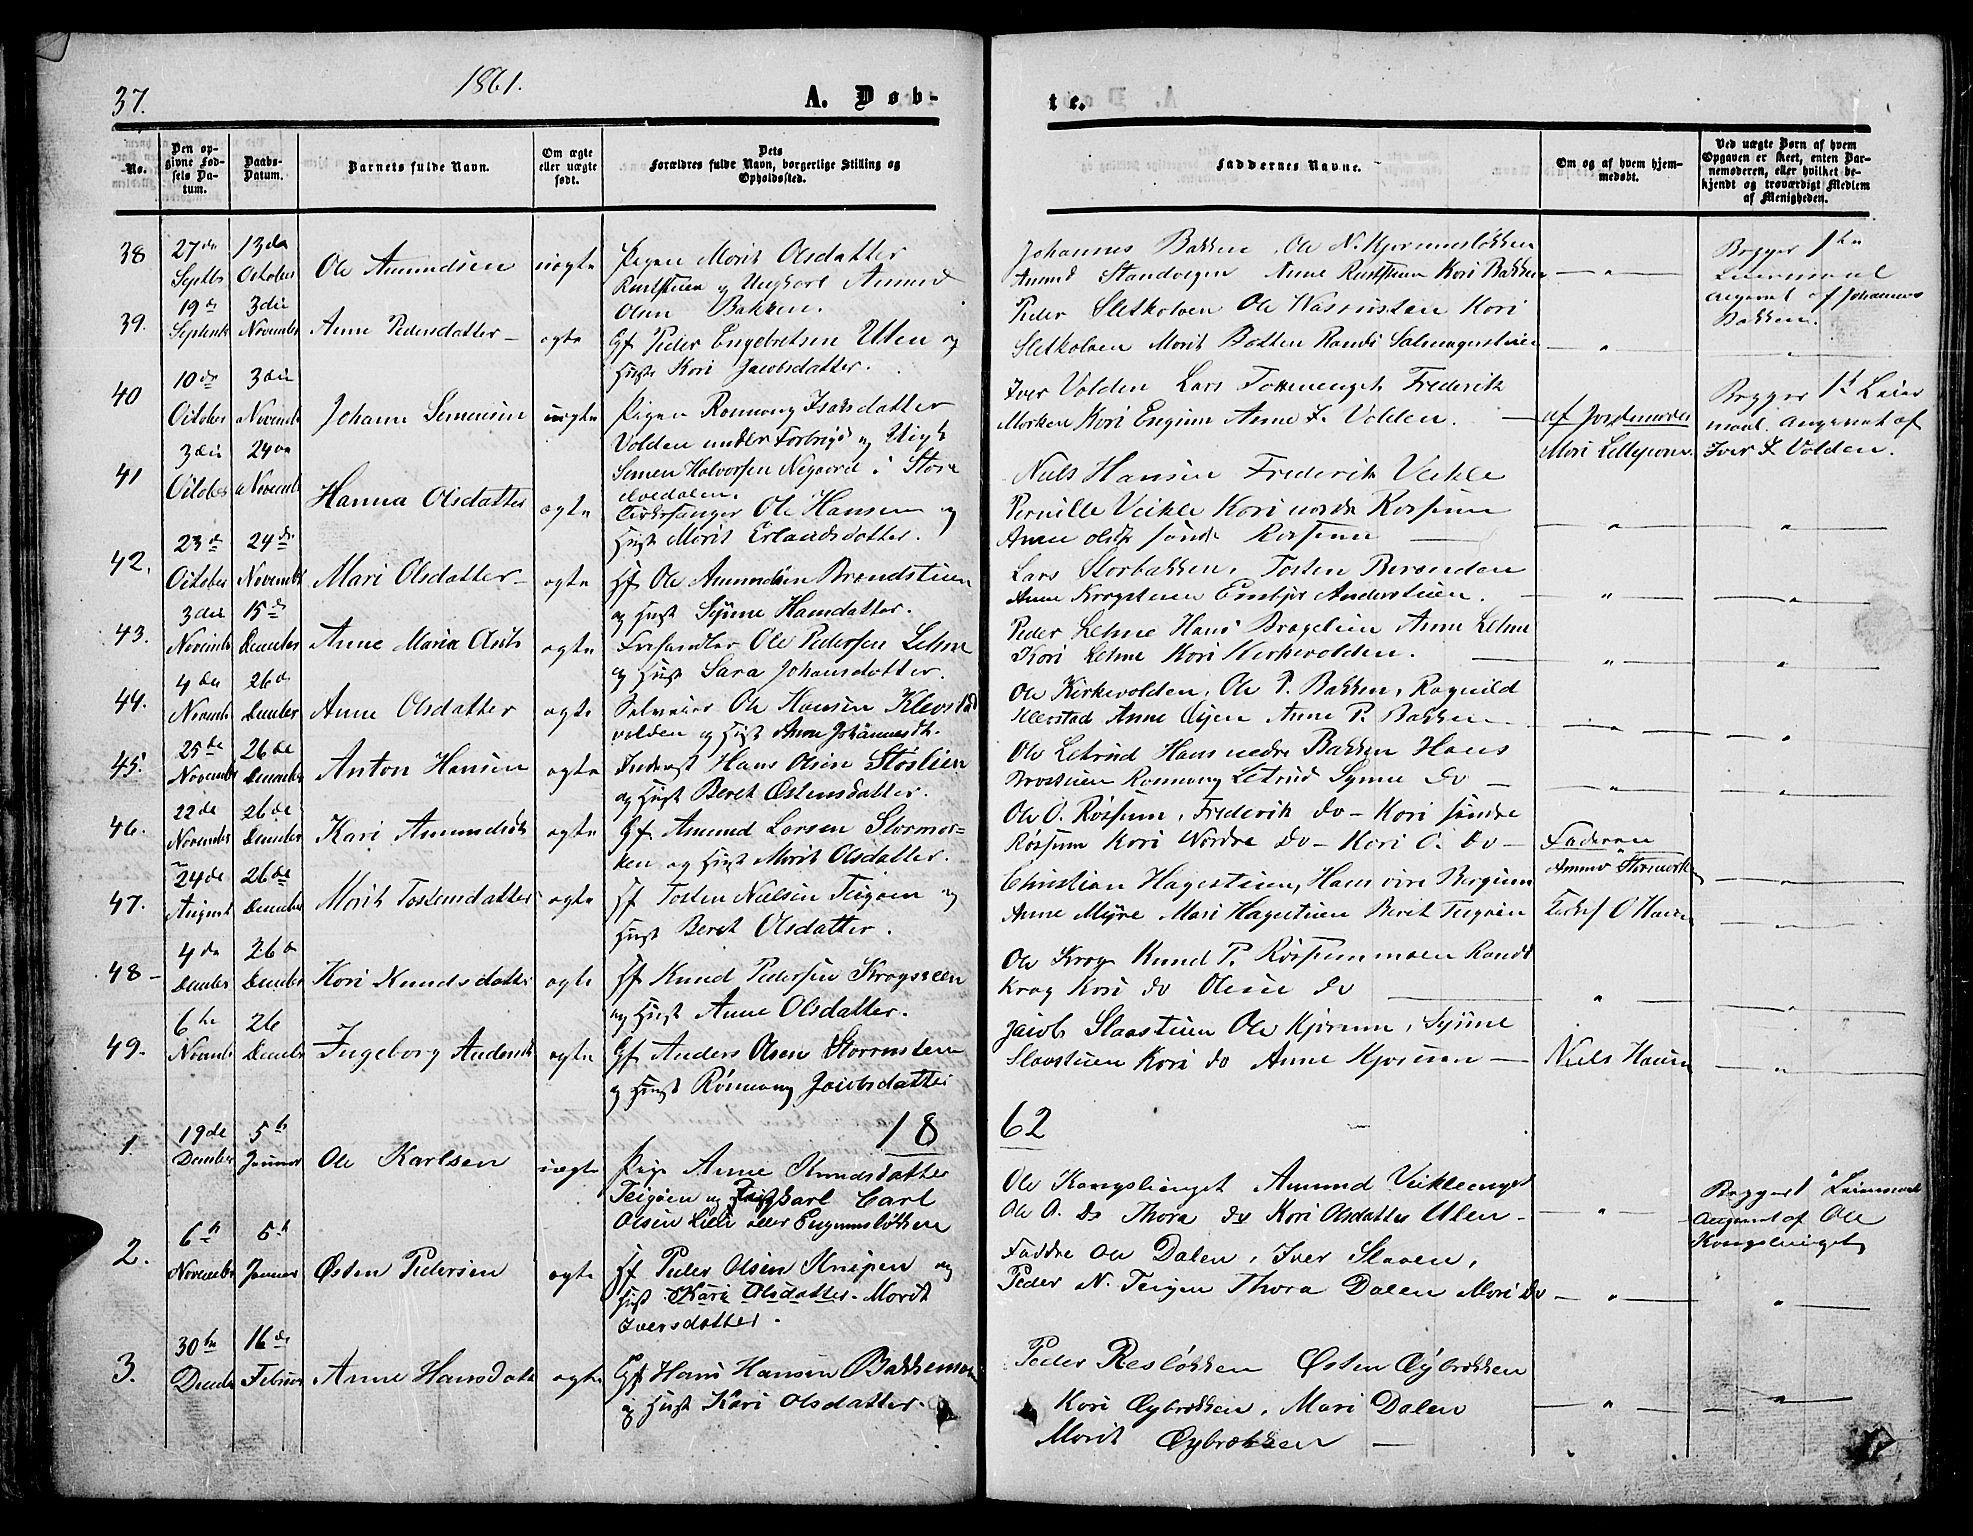 SAH, Nord-Fron prestekontor, Klokkerbok nr. 3, 1851-1886, s. 37